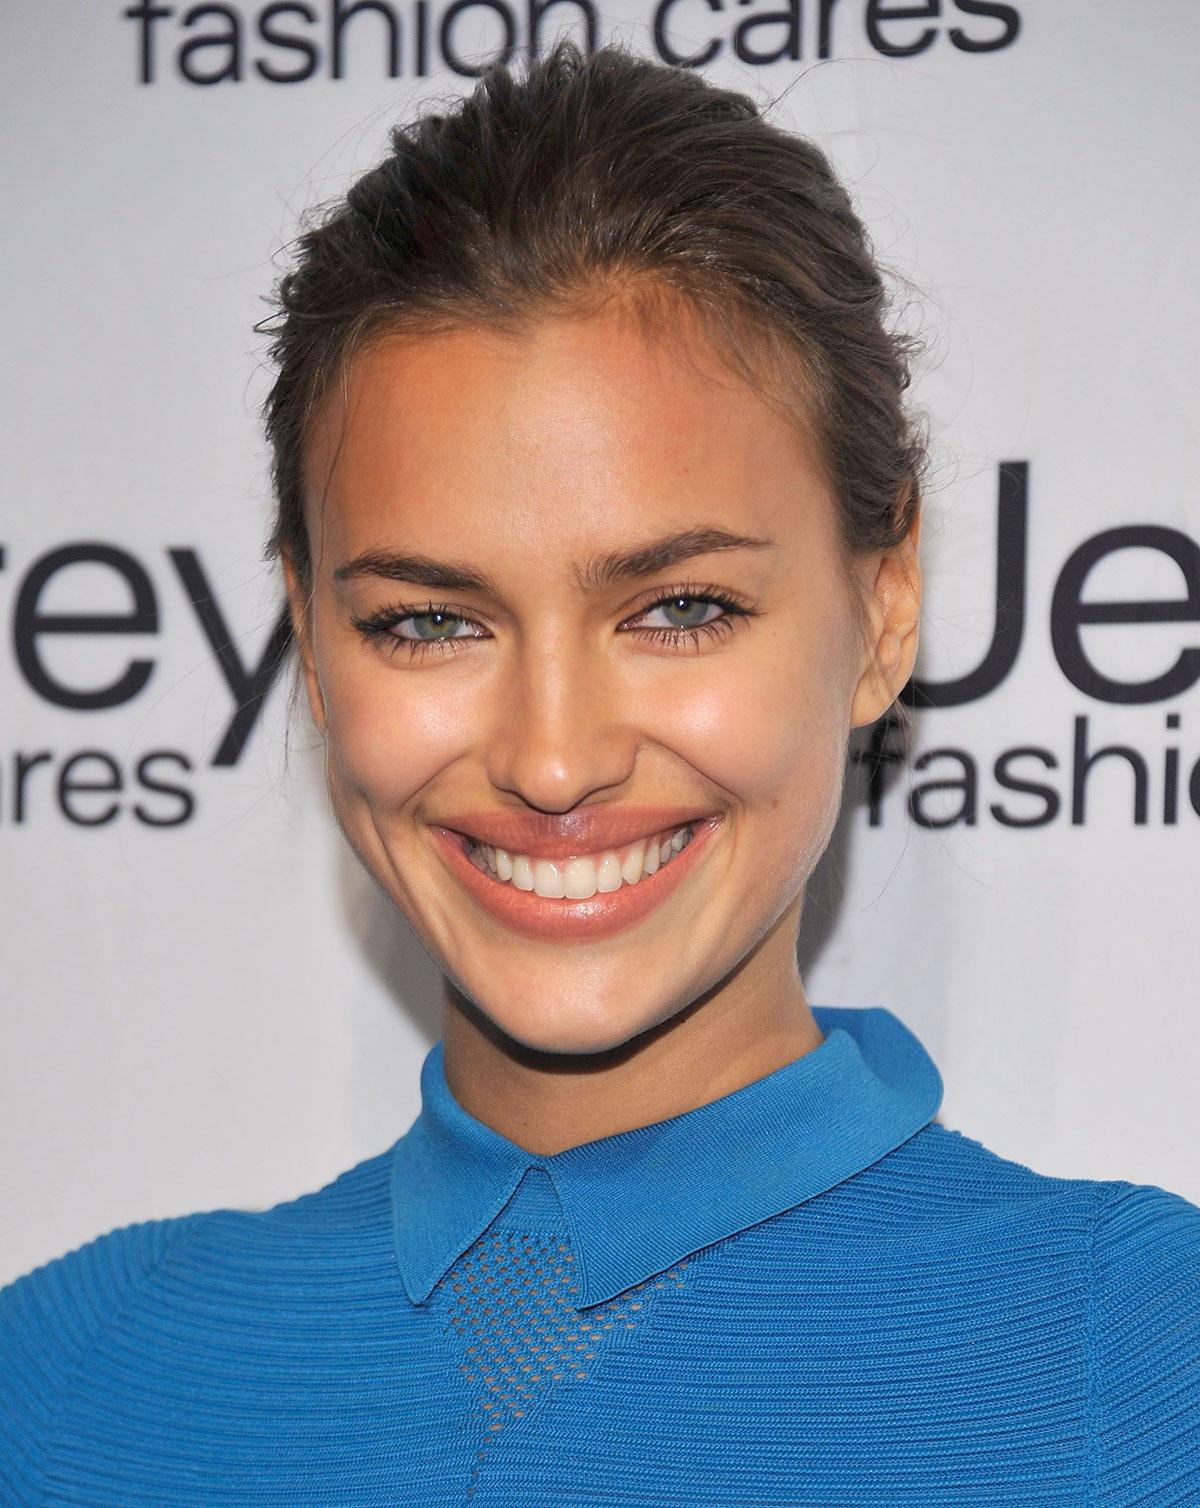 Irina shayk at jeffrey fashion cares in new york